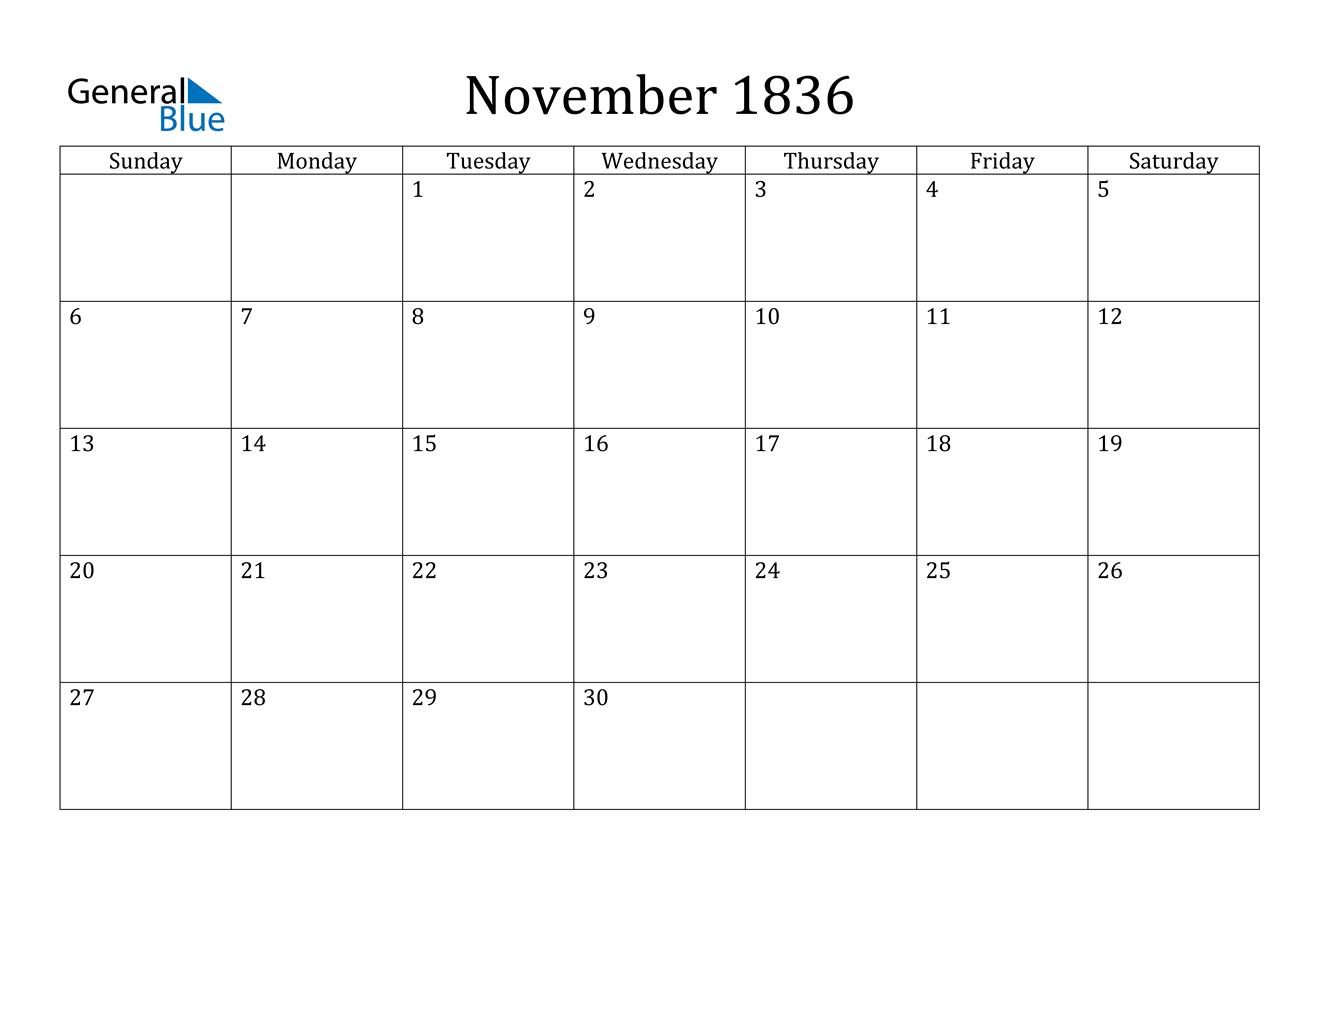 Image of November 1836 Calendar